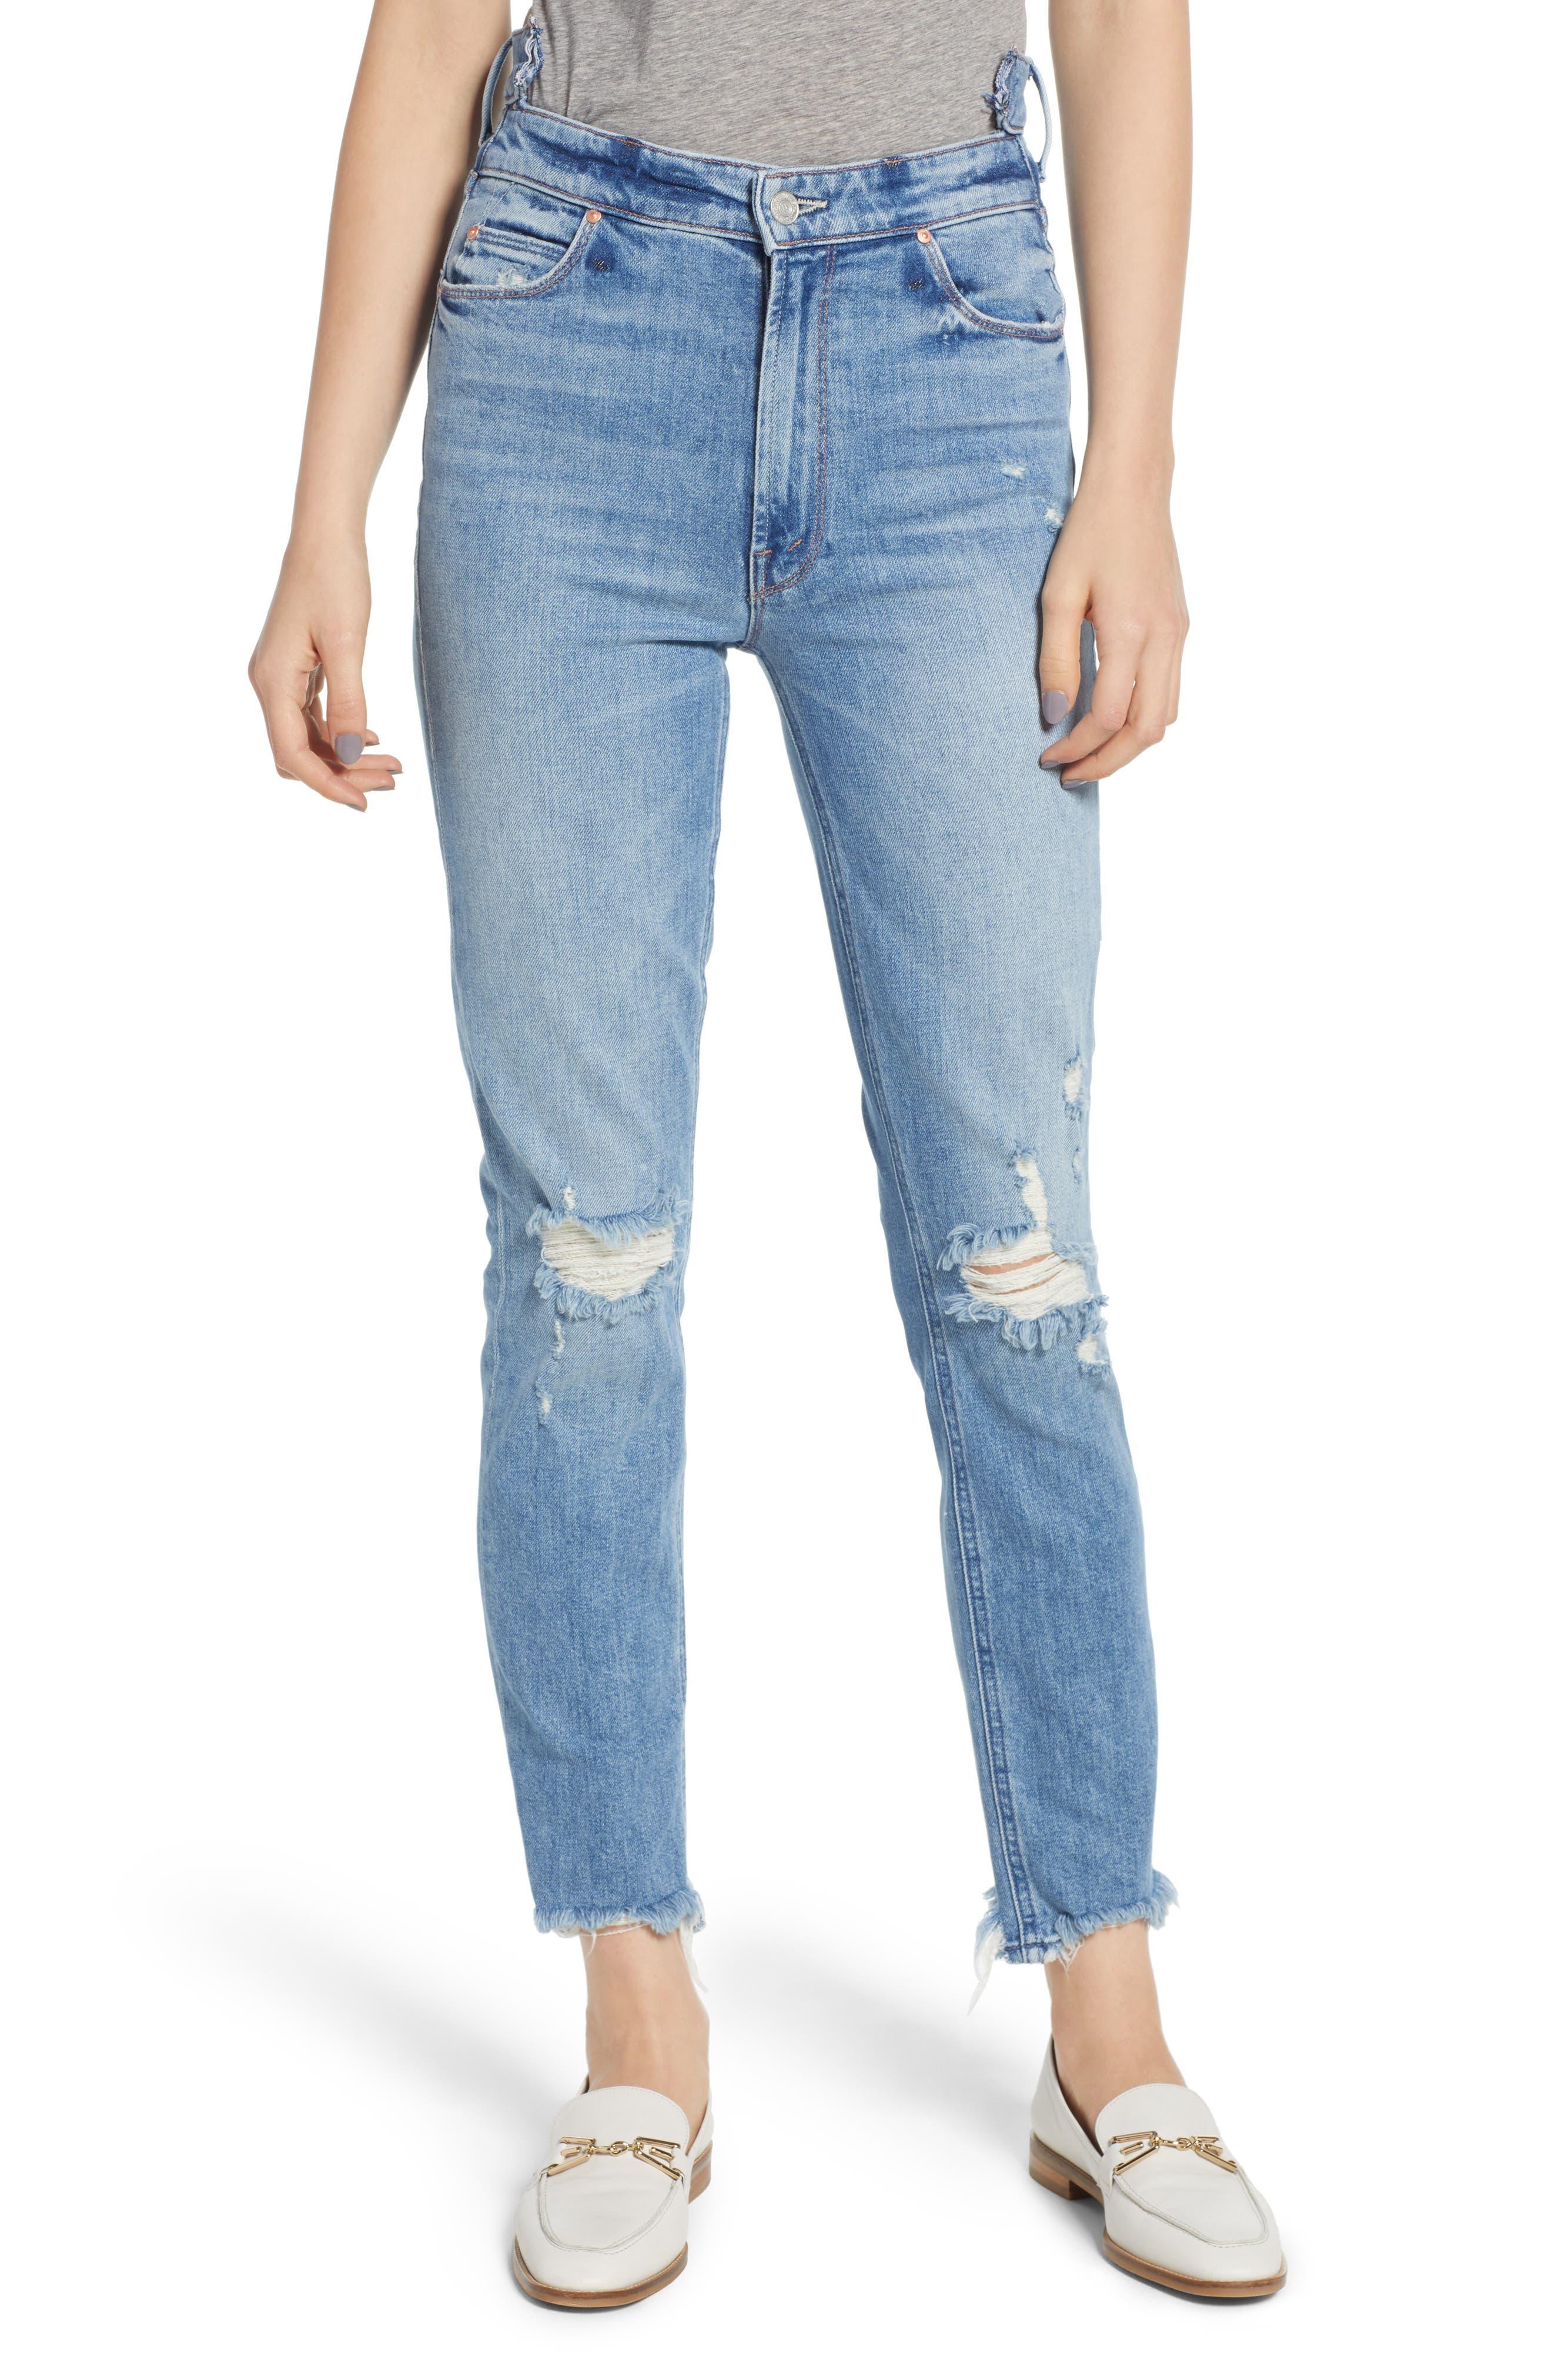 Dazzler Shift Step Waistband Jeans,                             Main thumbnail 1, color,                             452